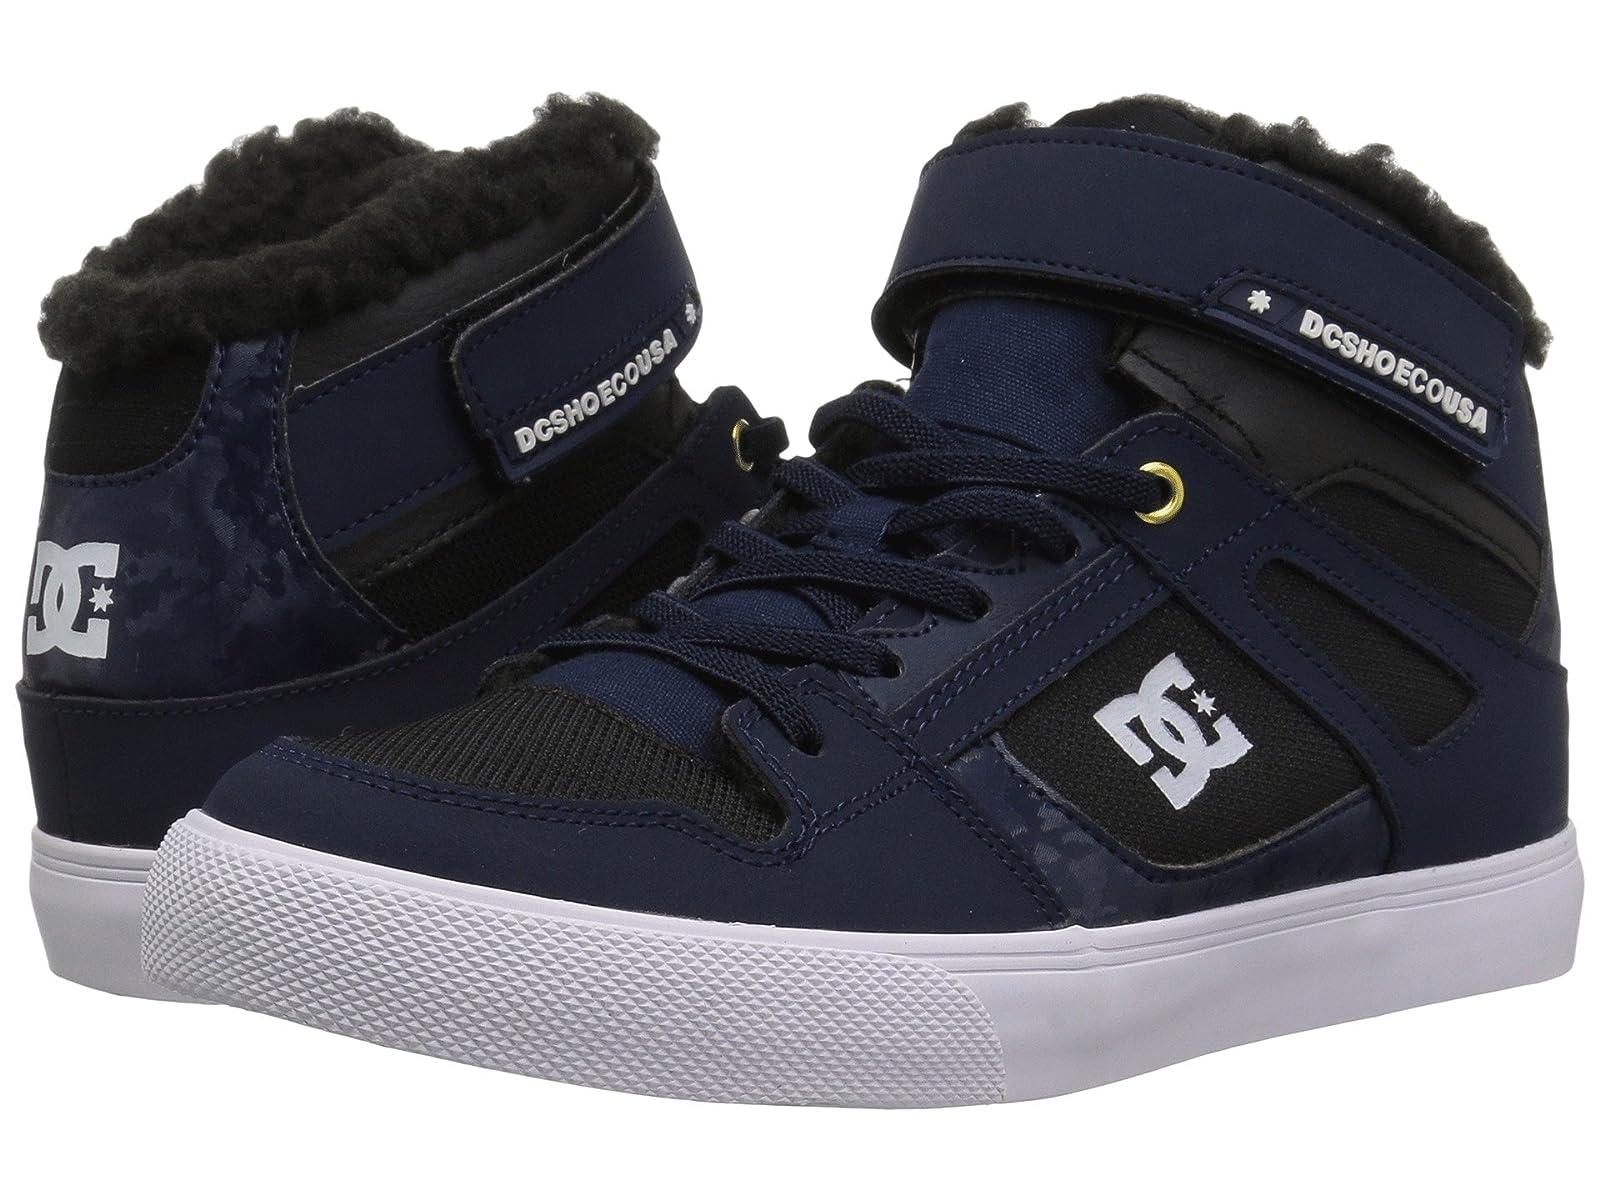 DC Kids Spartan High WNT EV (Little Kid/Big Kid)Cheap and distinctive eye-catching shoes